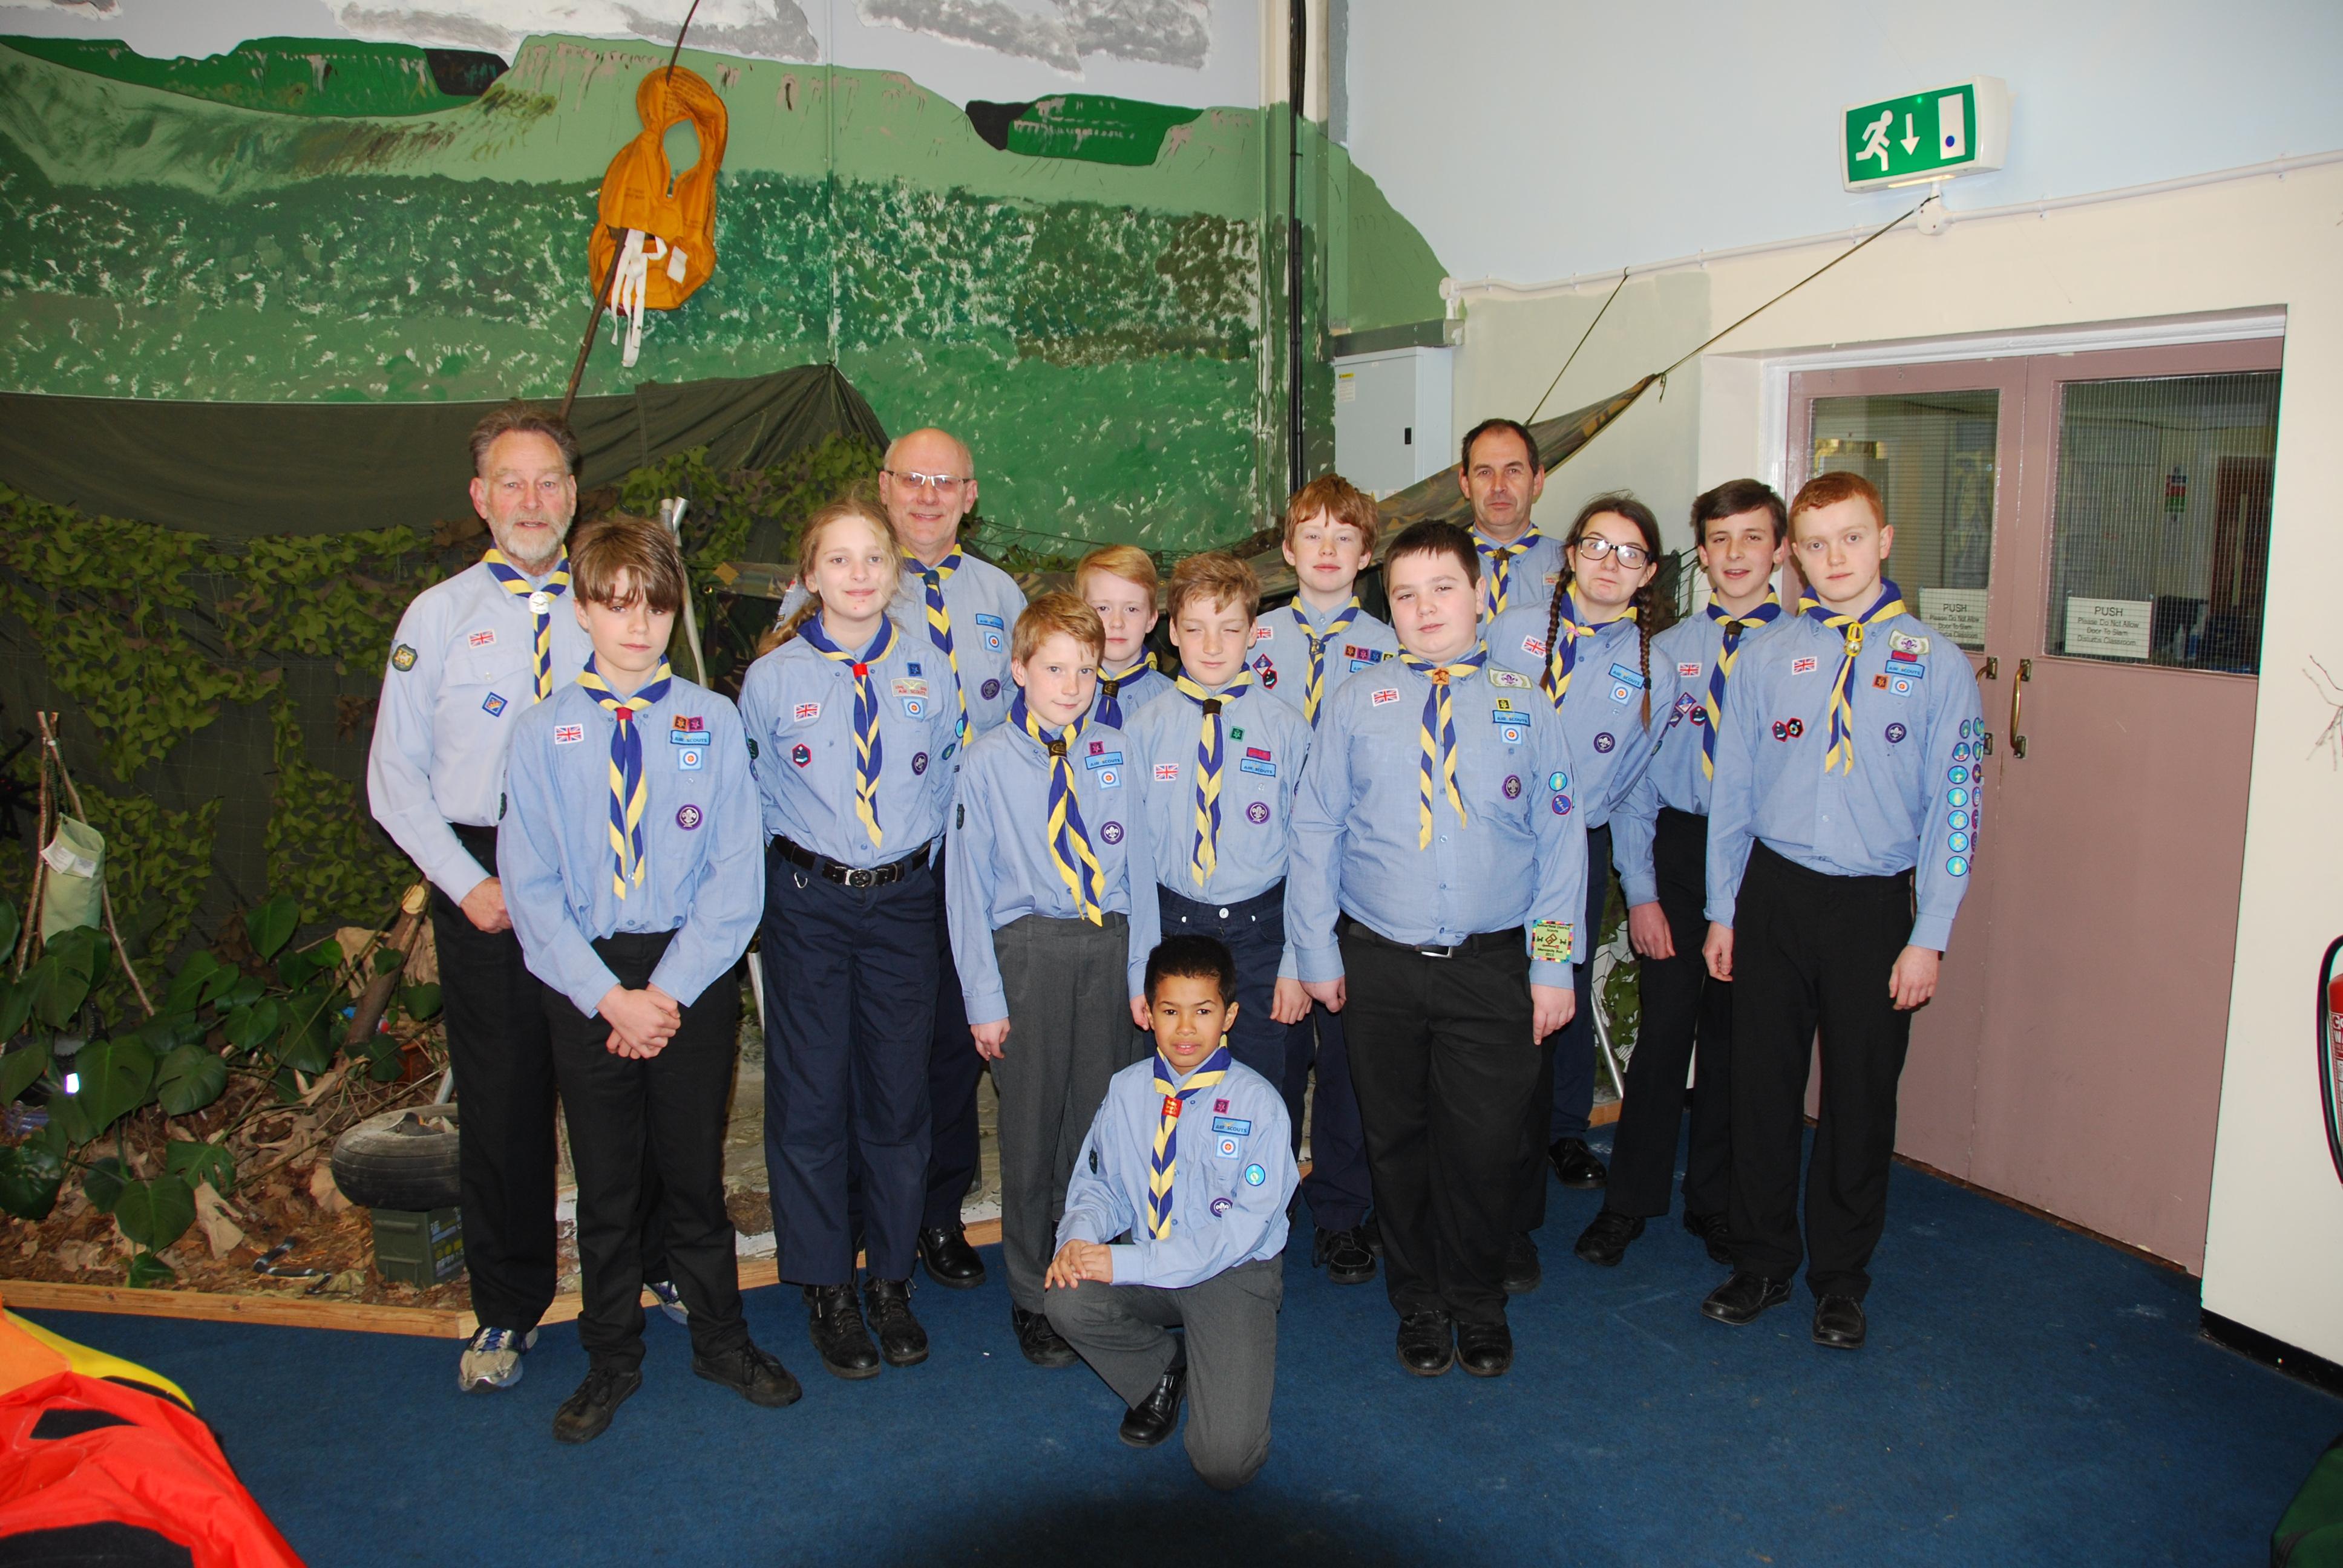 RAF Brize Norton SERE